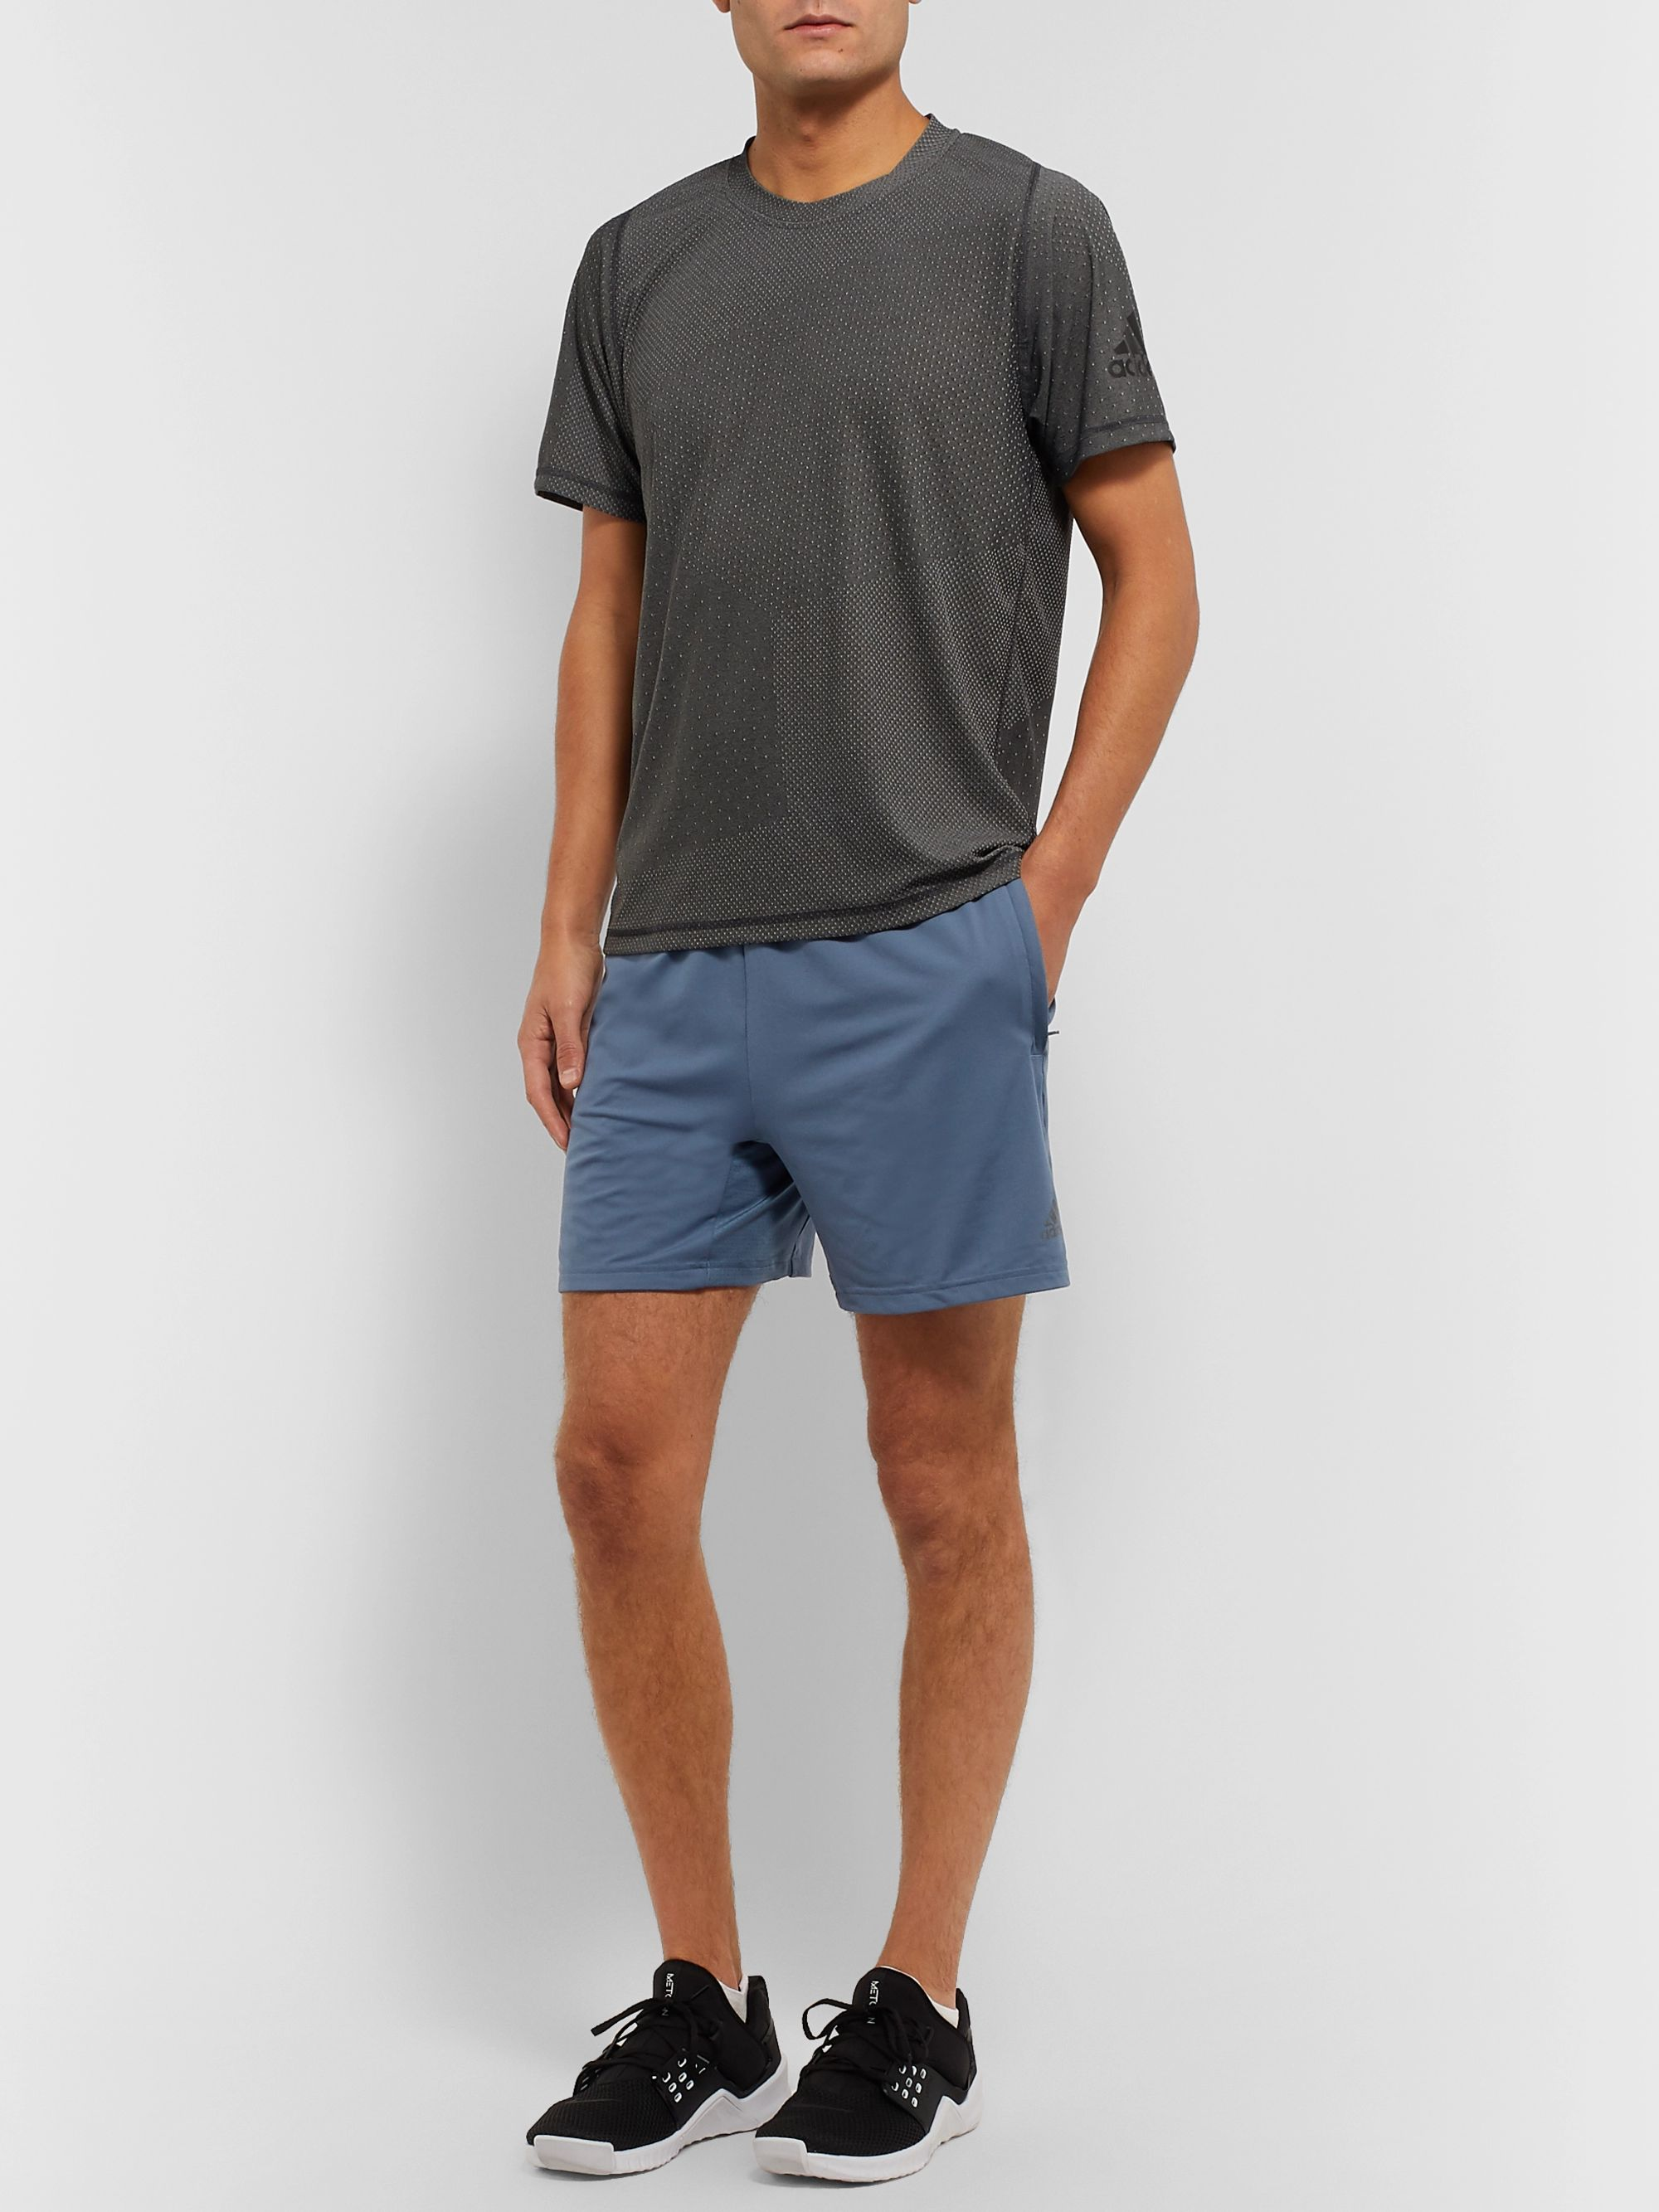 adidas shorts 4krft